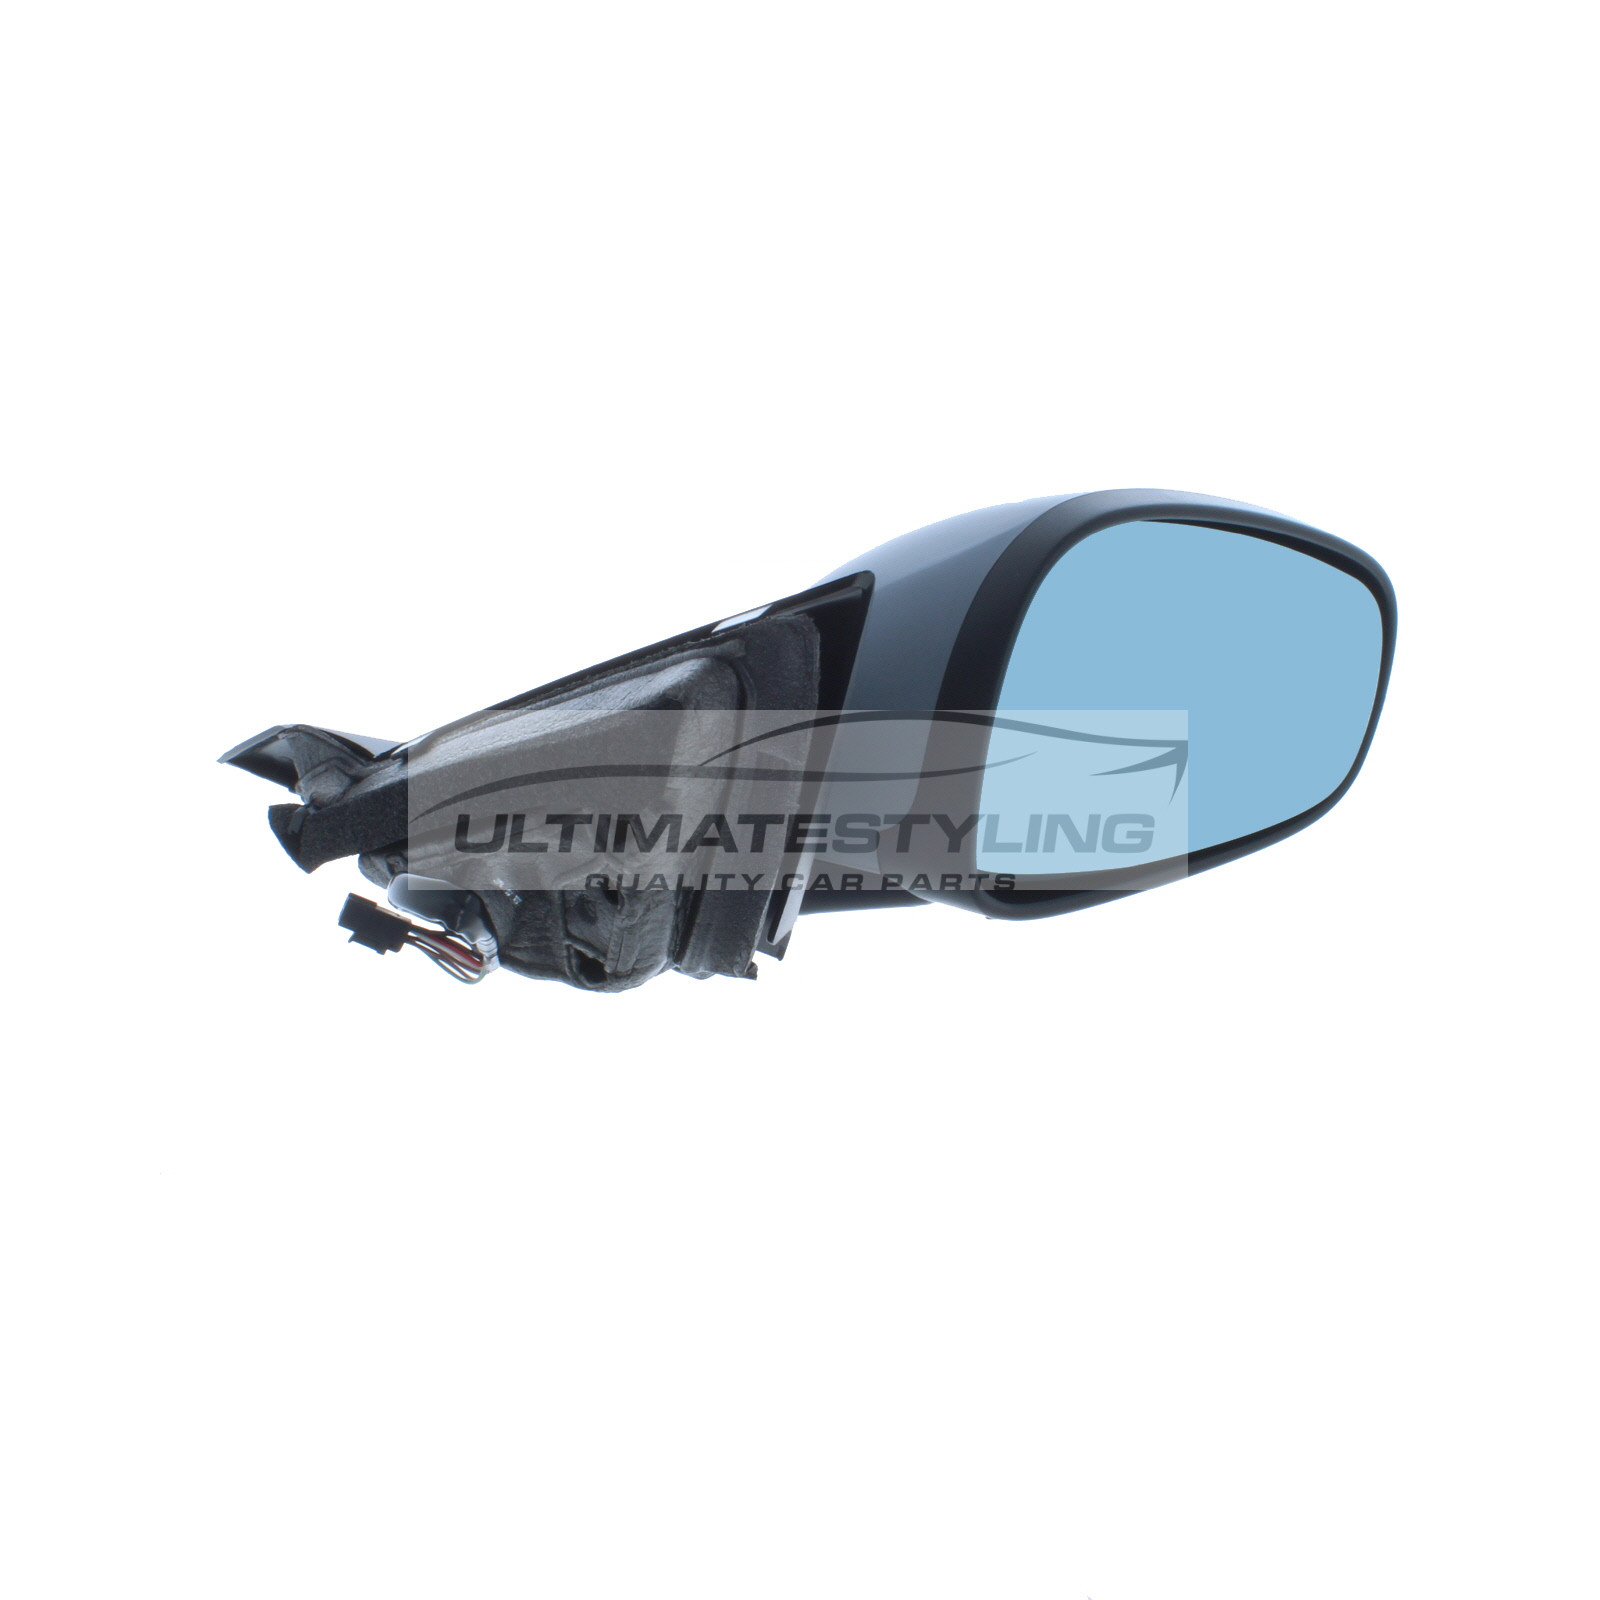 Alfa Romeo Giulietta Wing Mirror / Door Mirror - Drivers Side (RH) - Electric adjustment - Heated Glass - Temperature Sensor - Primed